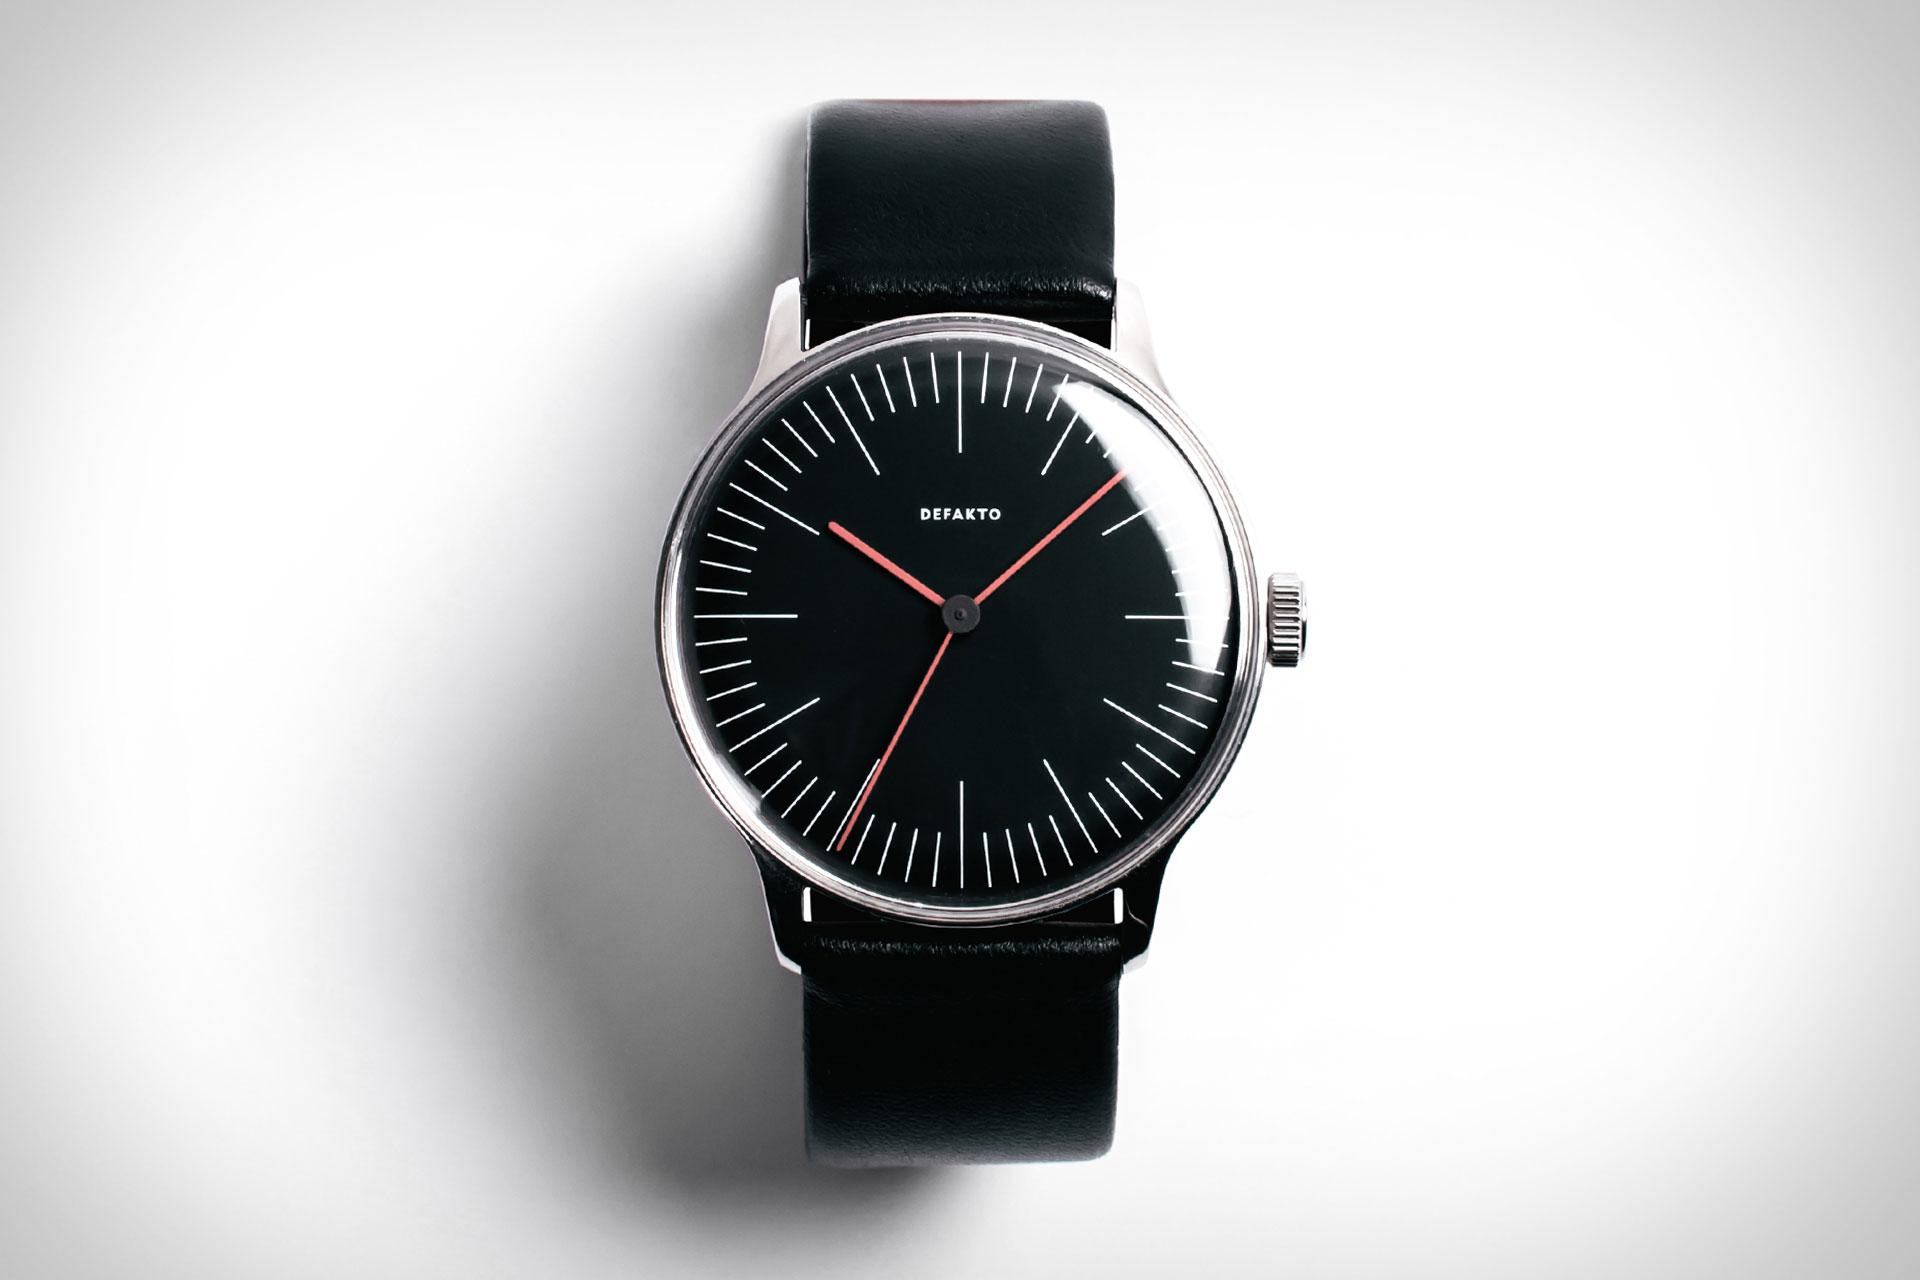 Defakto Vektor Watch